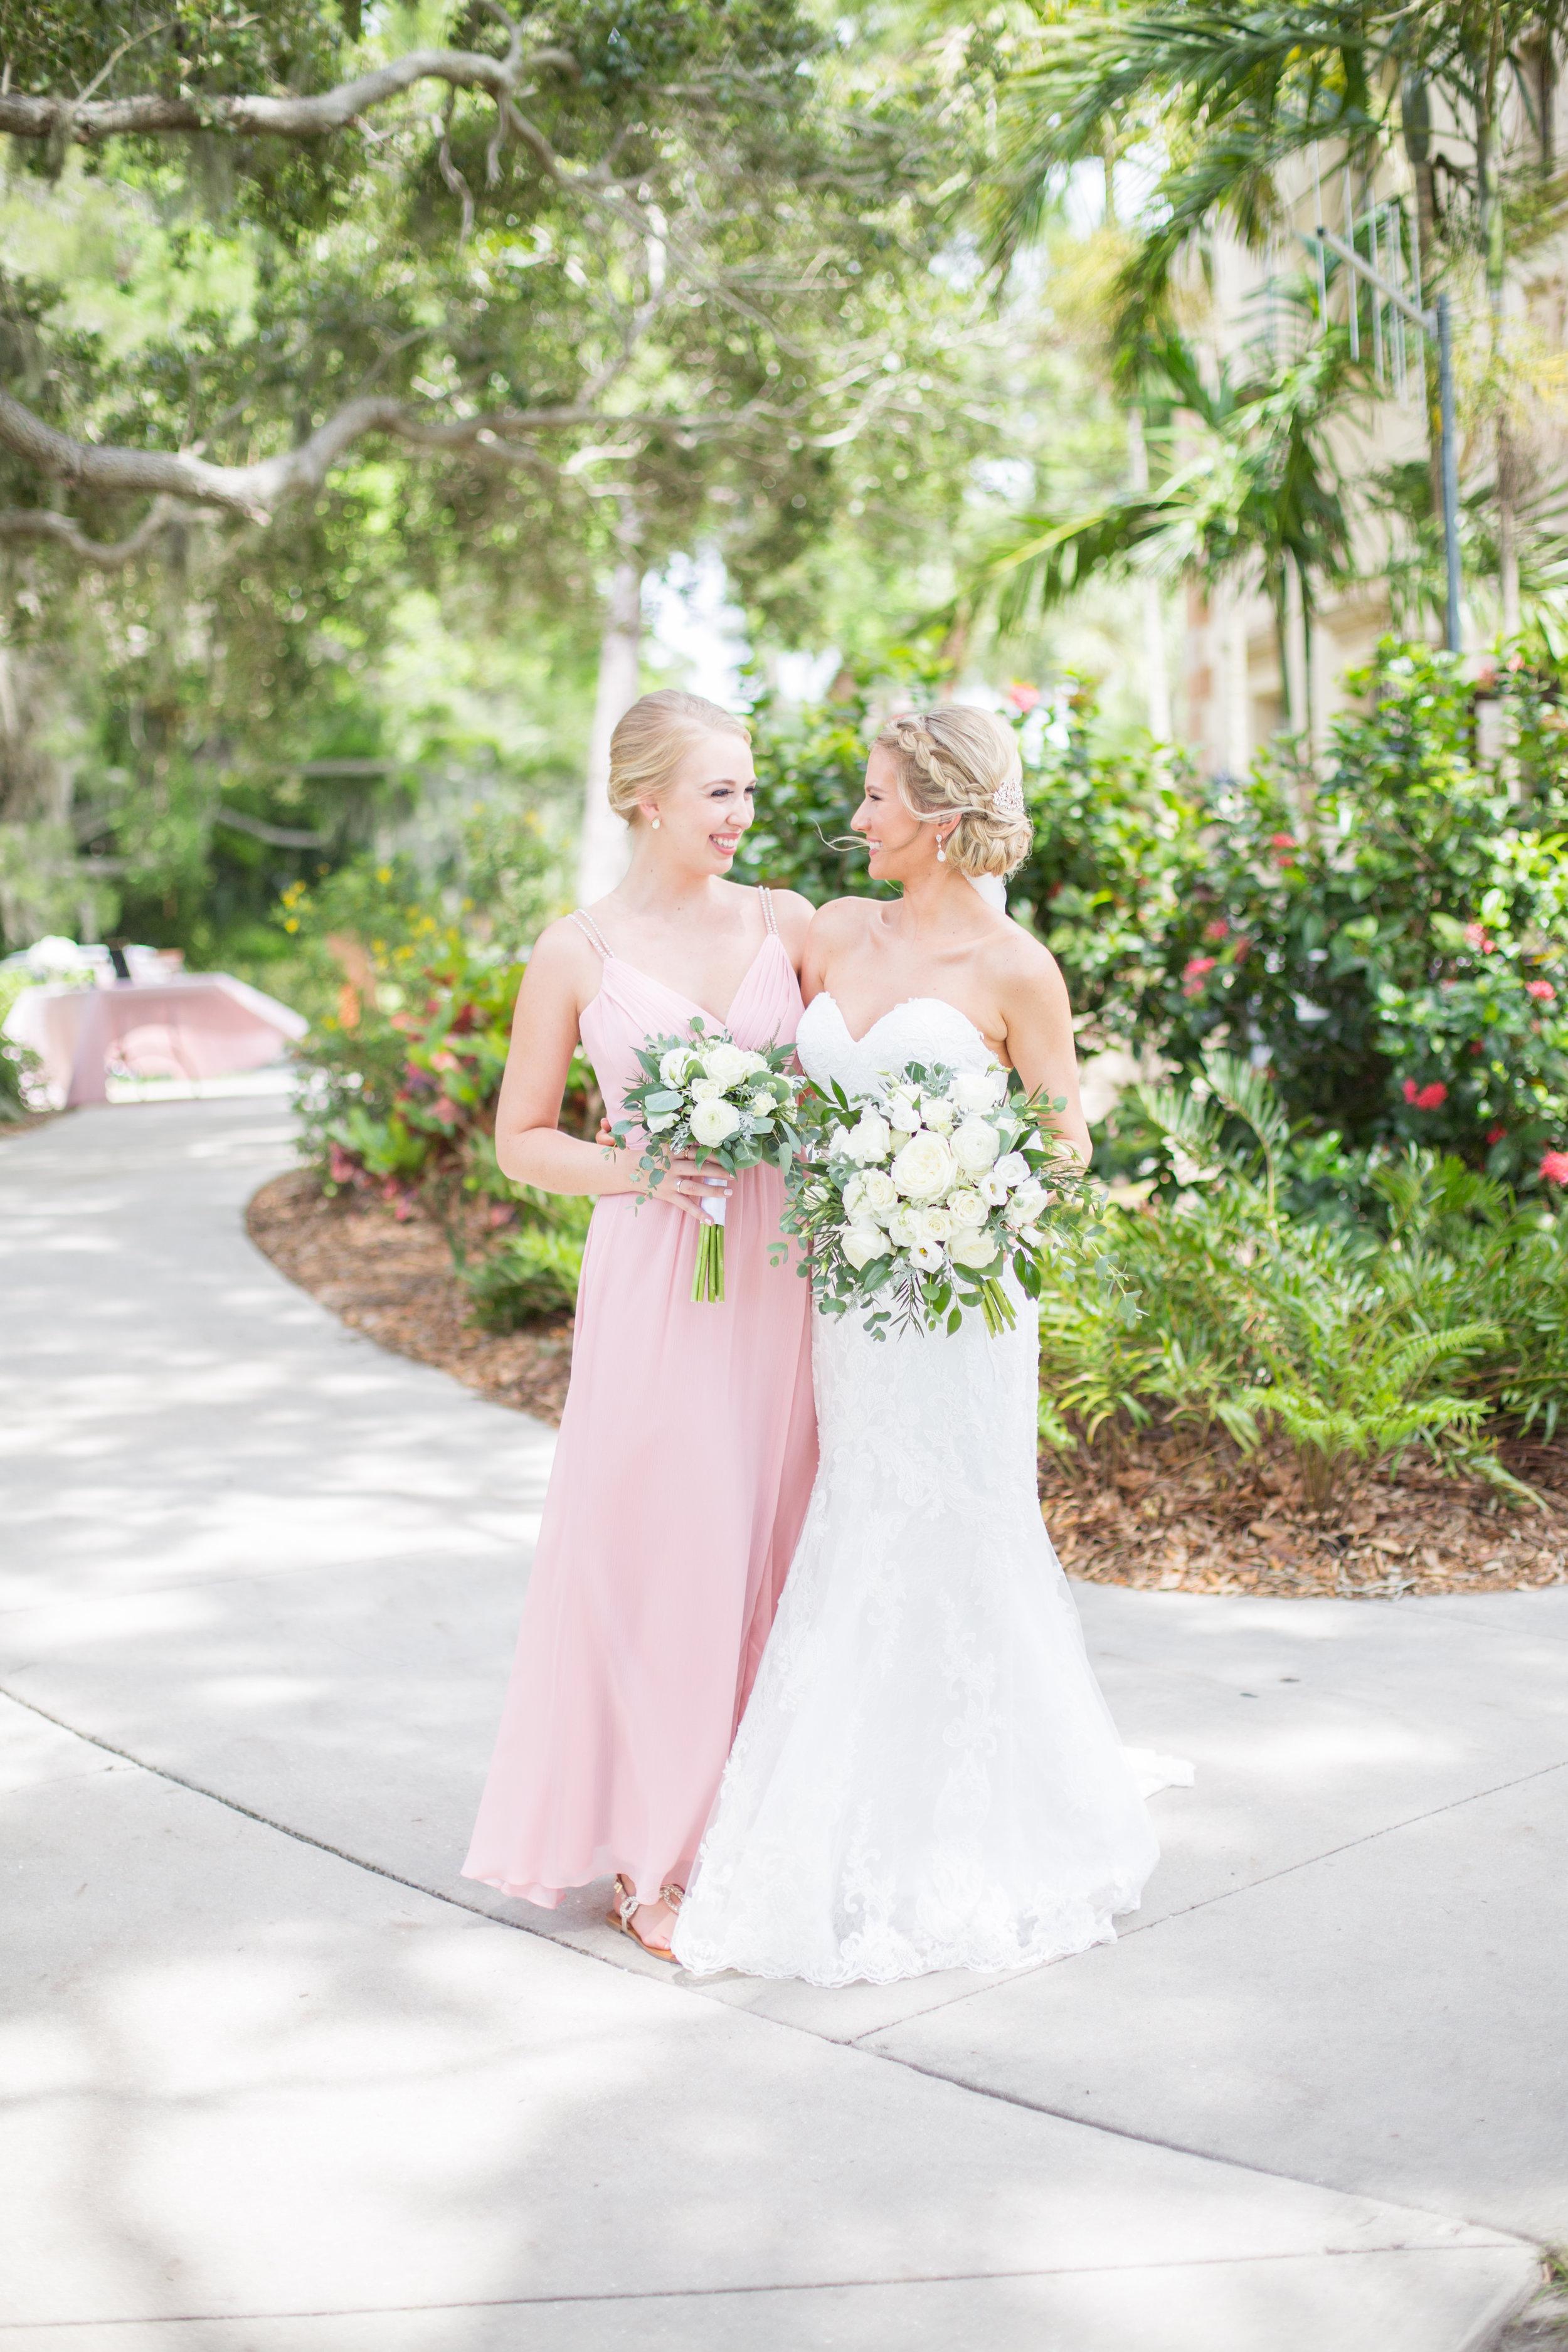 Powel Crosley Estate   Wedding   Pink and Gold Wedding   Bridesmaids Dresses   Wedding Bouquet   Sarasota Weddings   Spring Wedding   Jess Anne Photography